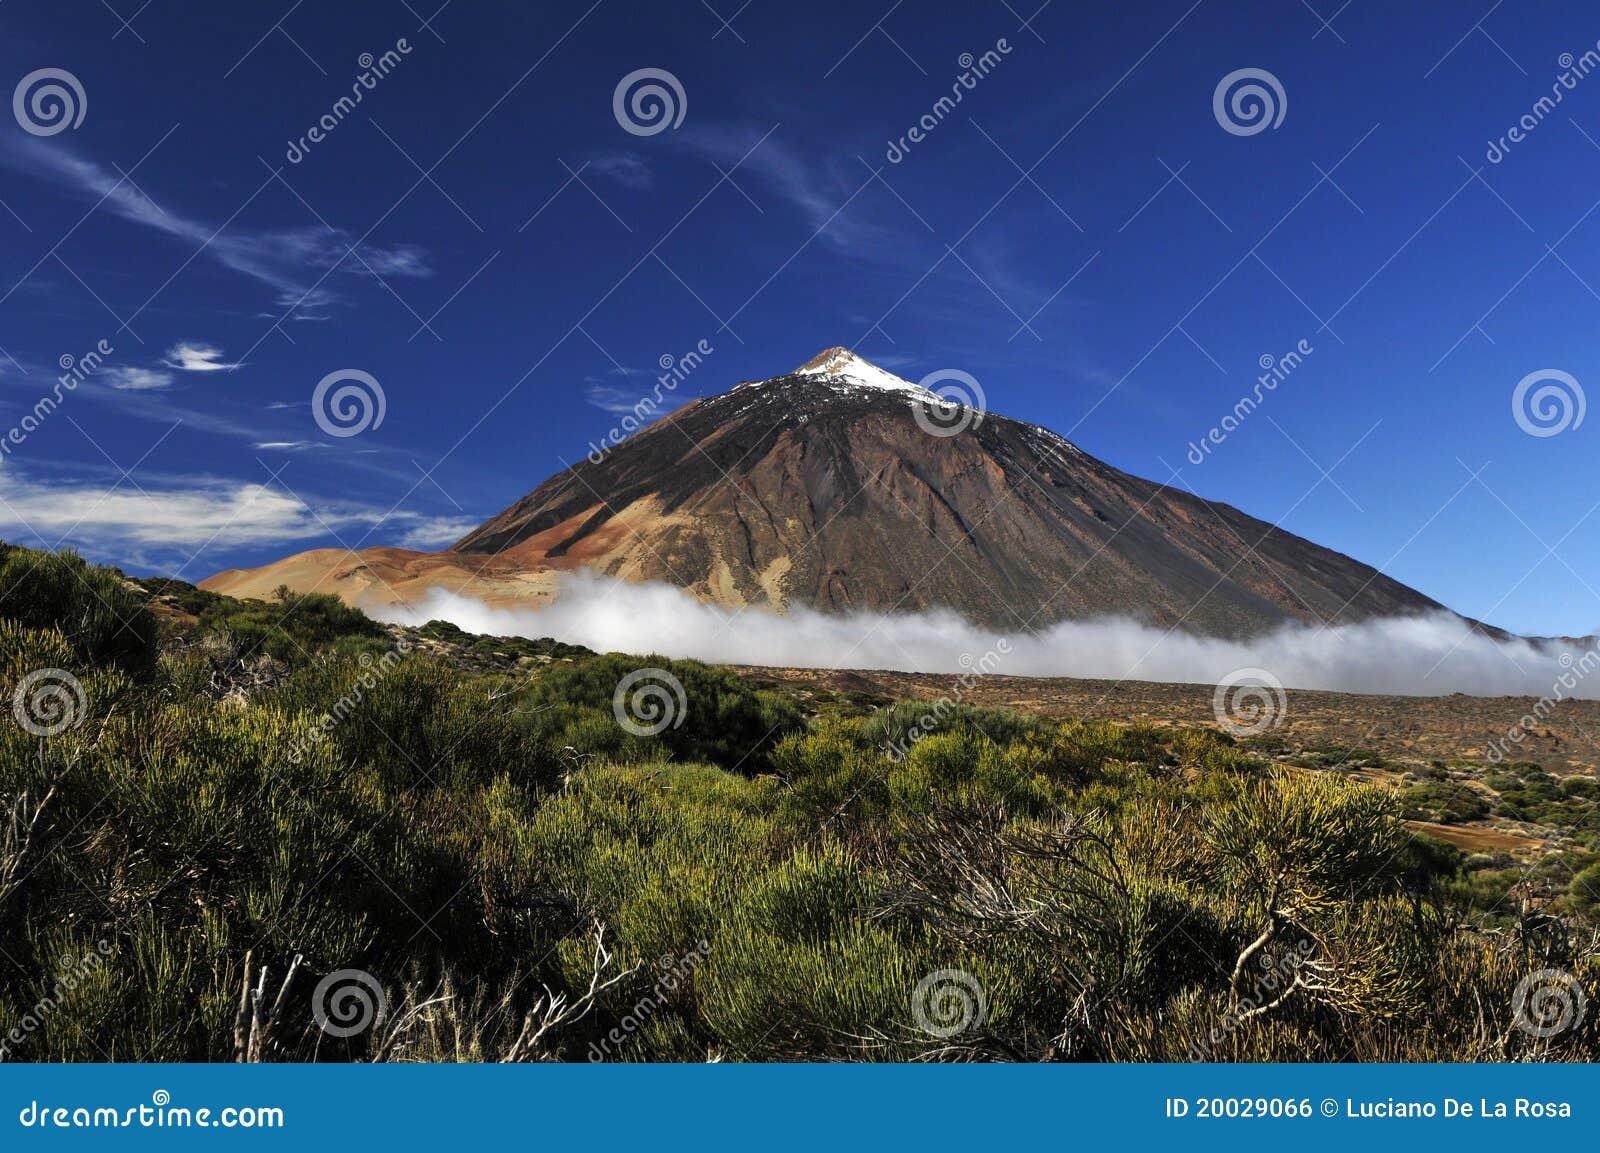 Teide volcano from far